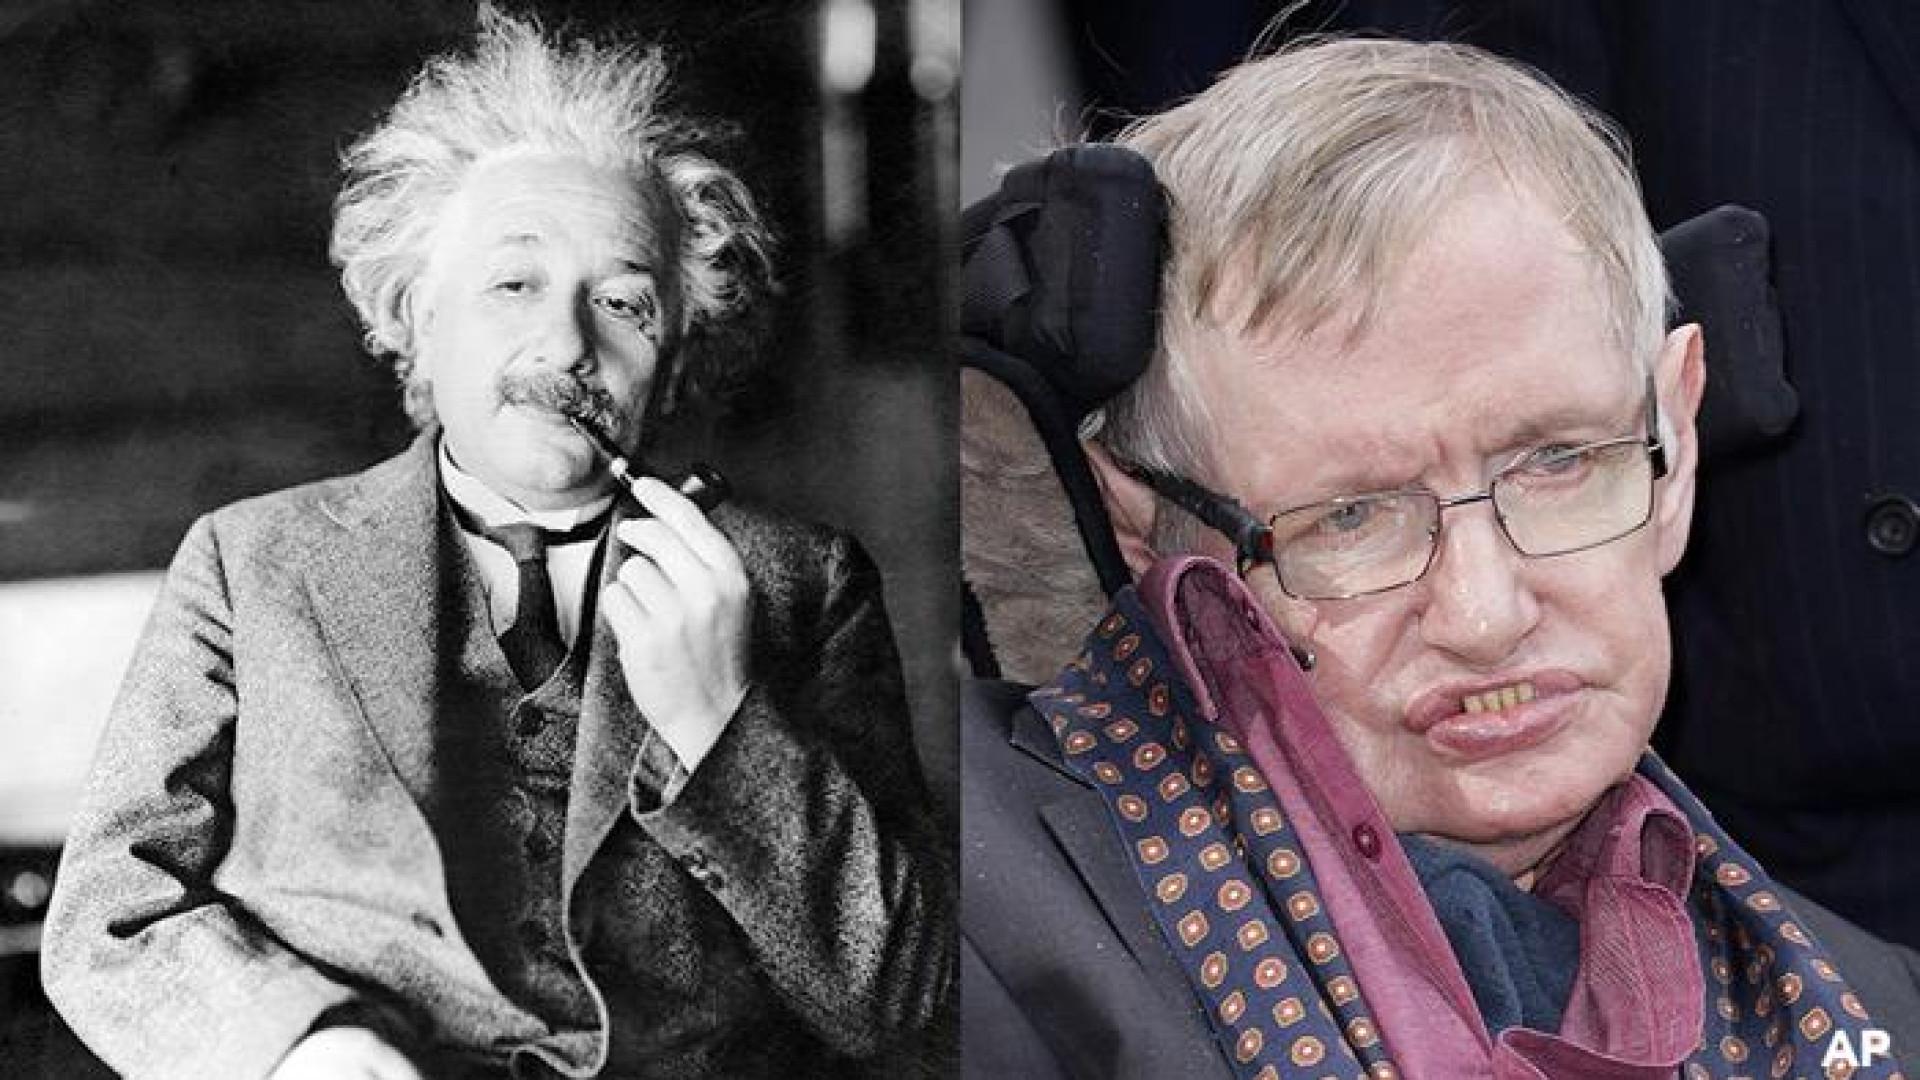 Stephen Hawking morreu no dia do aniversário de Albert Einstein